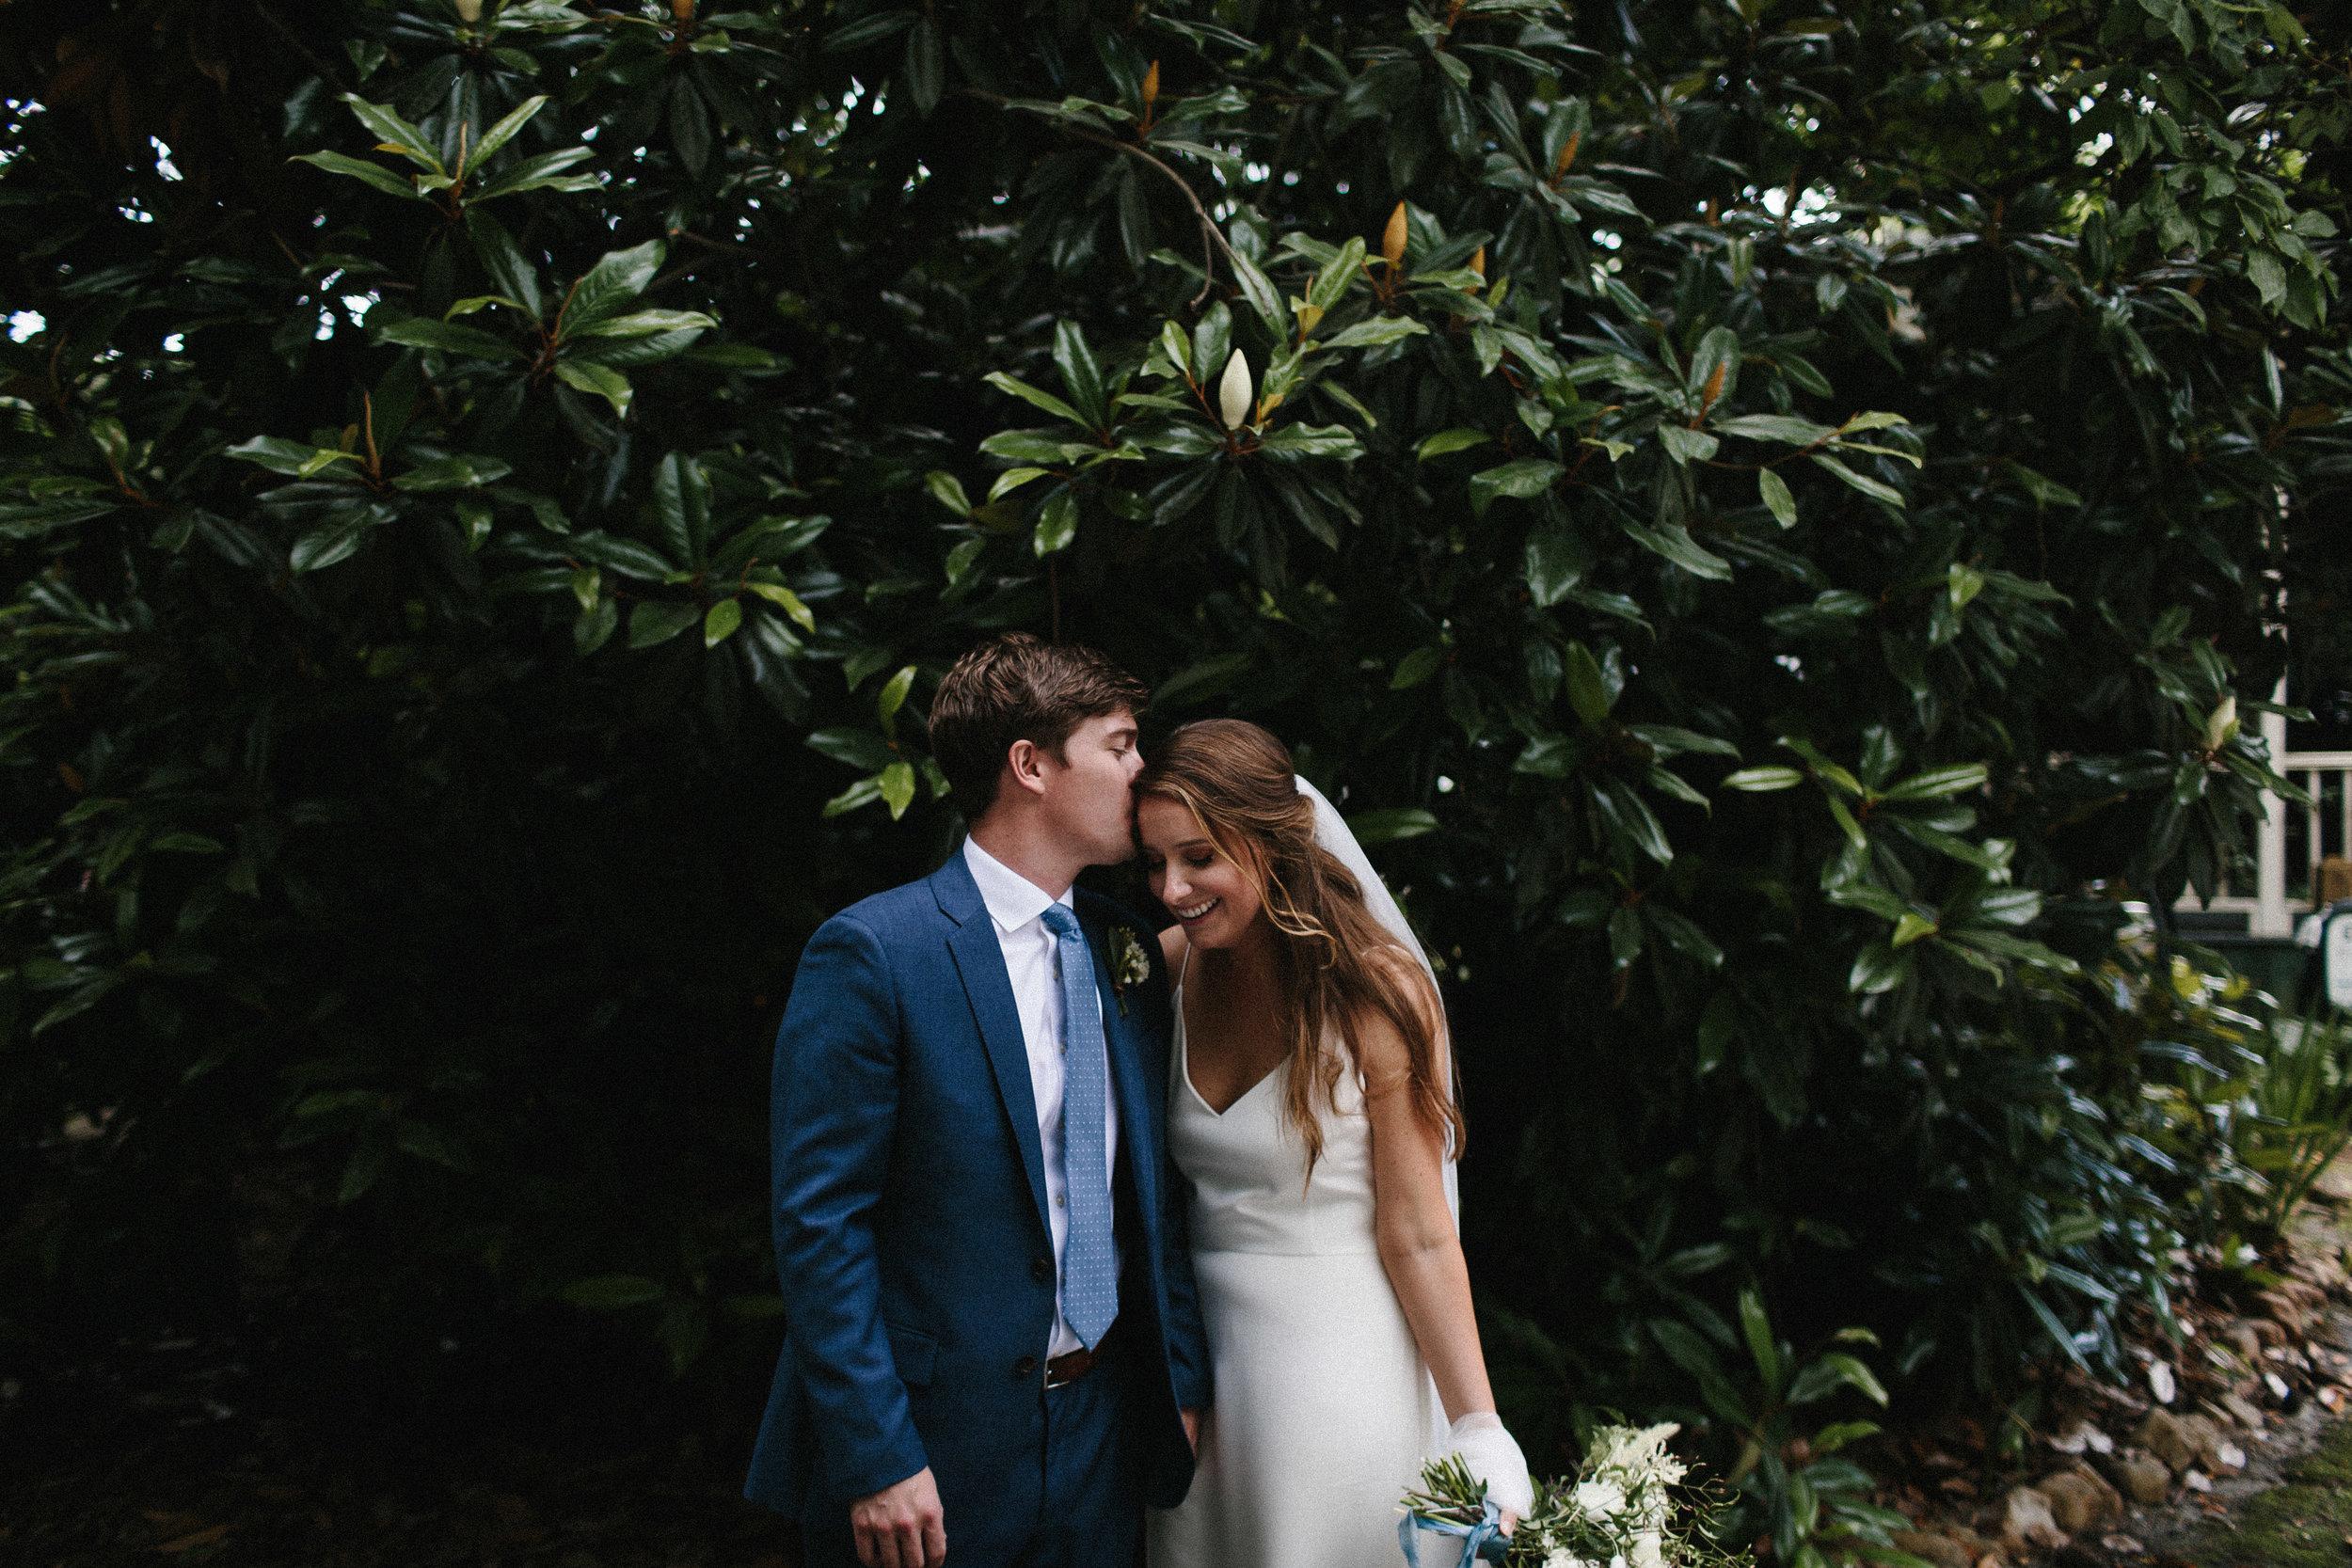 glen_ella_meadow_creekside_atlanta_wedding_photographers_1437.jpg